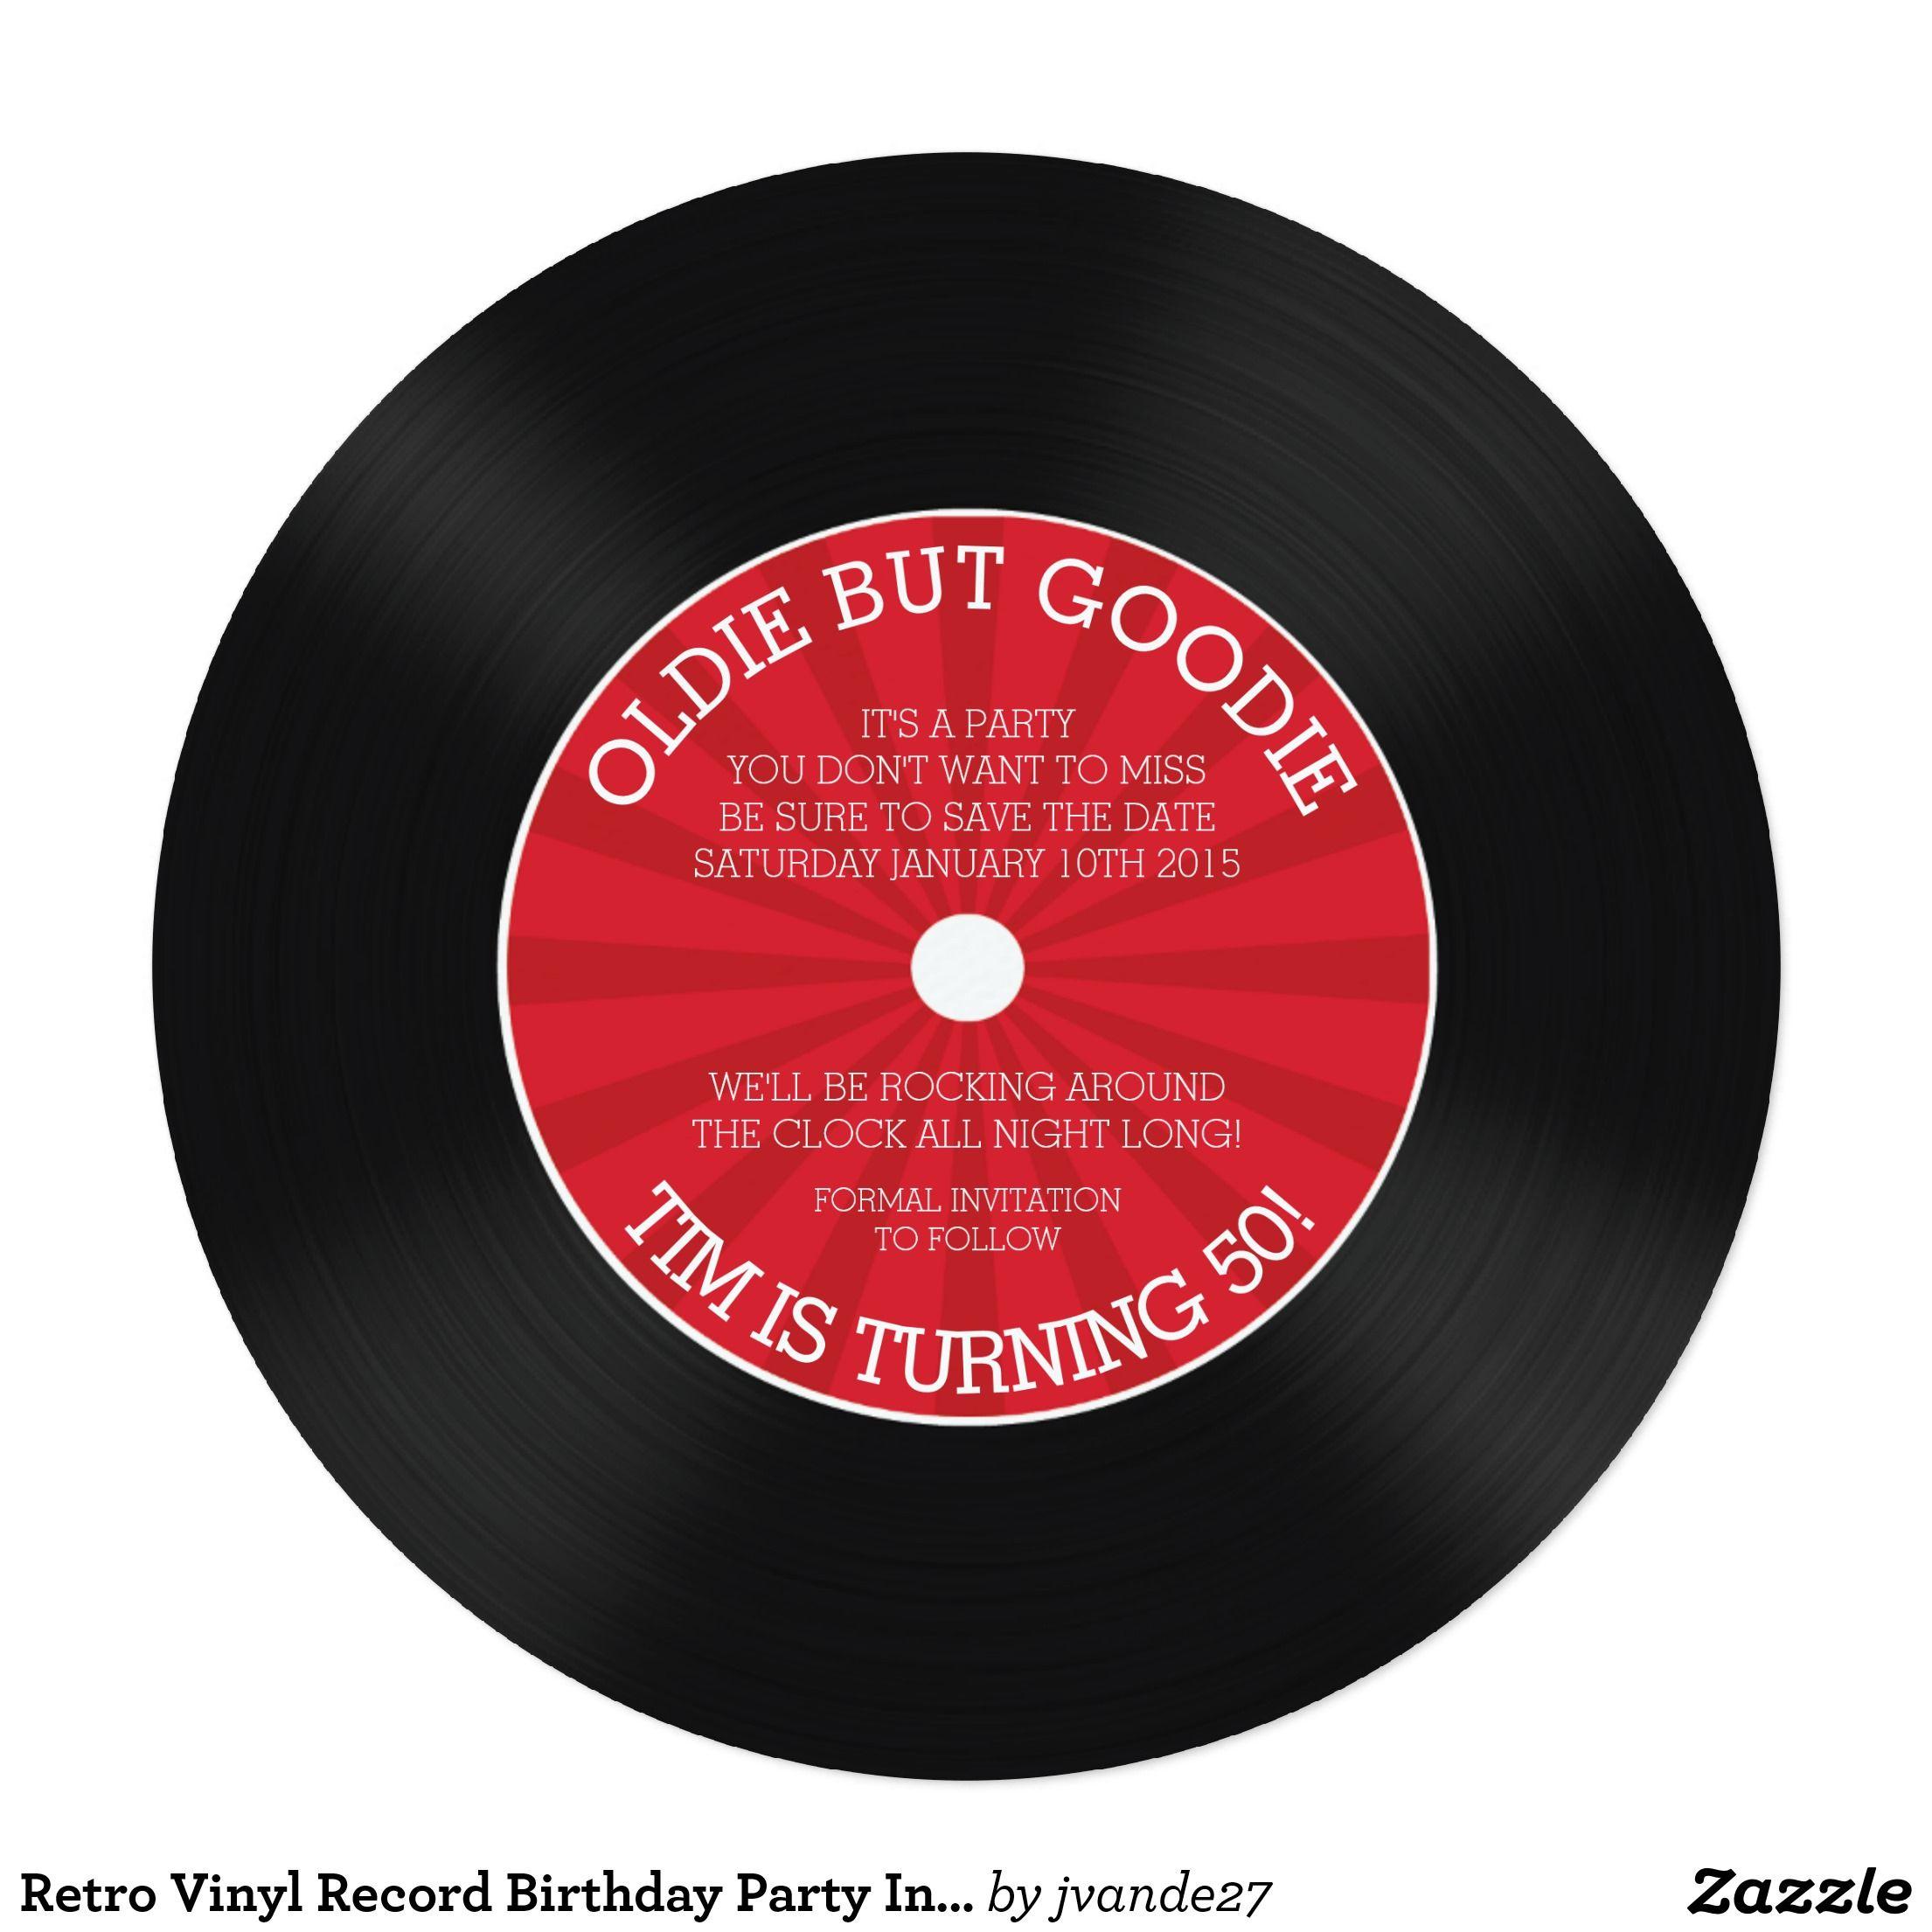 Retro Vinyl Record Birthday Party Invitation | Pinterest | Party ...